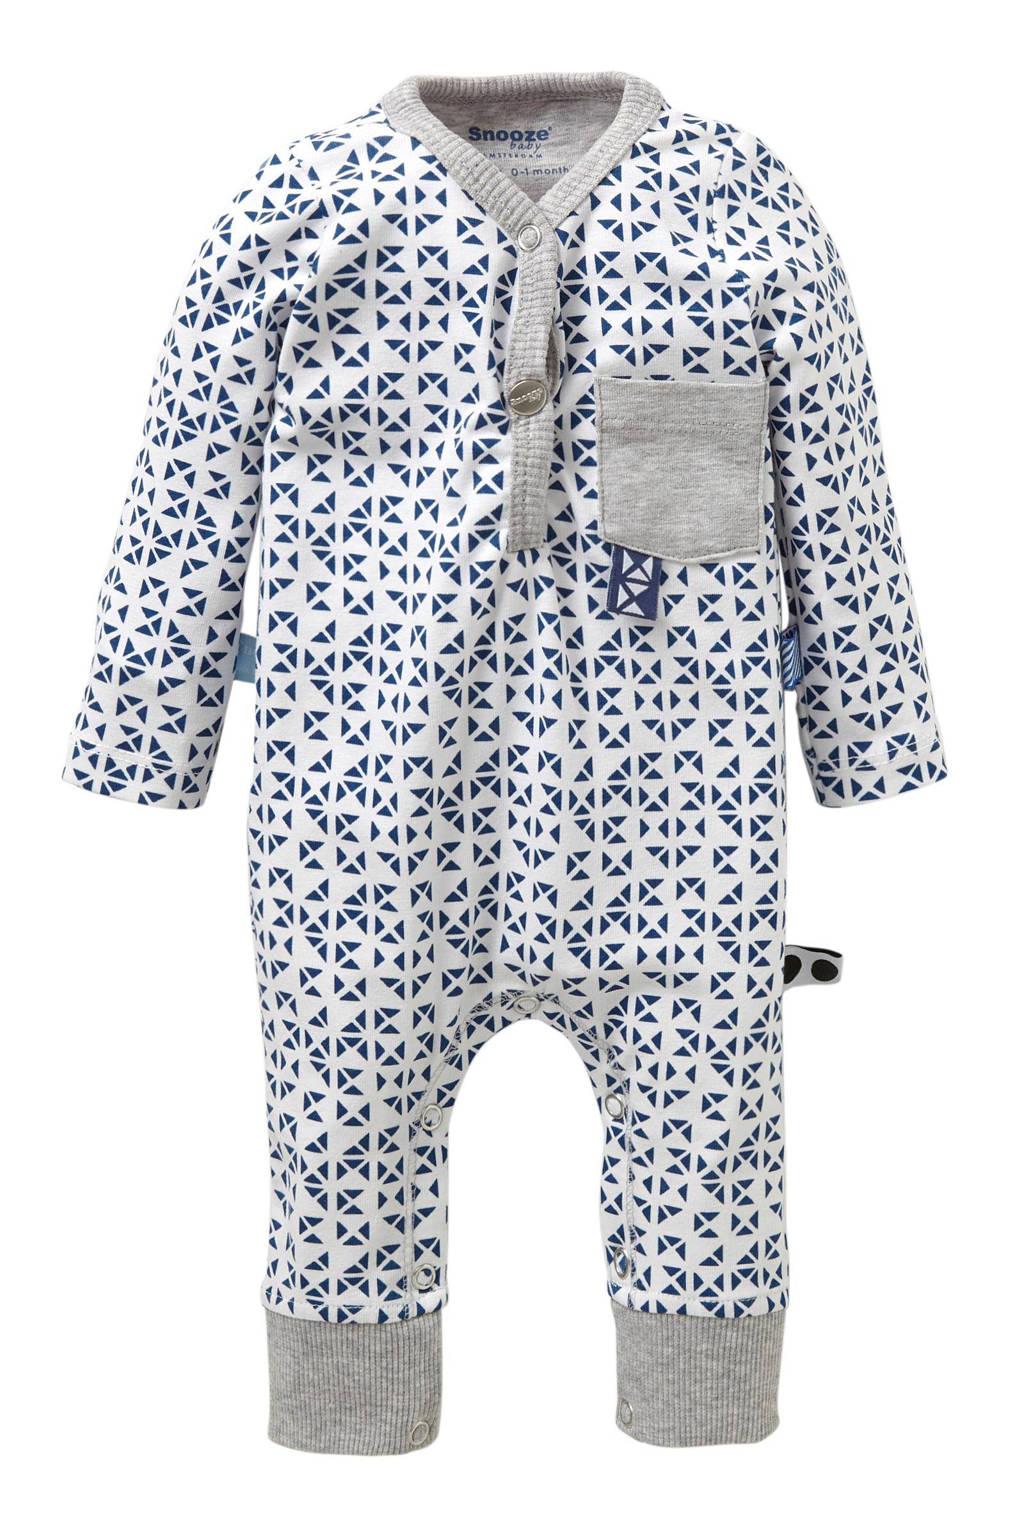 Snoozebaby newborn boxpak, Blauw/wit